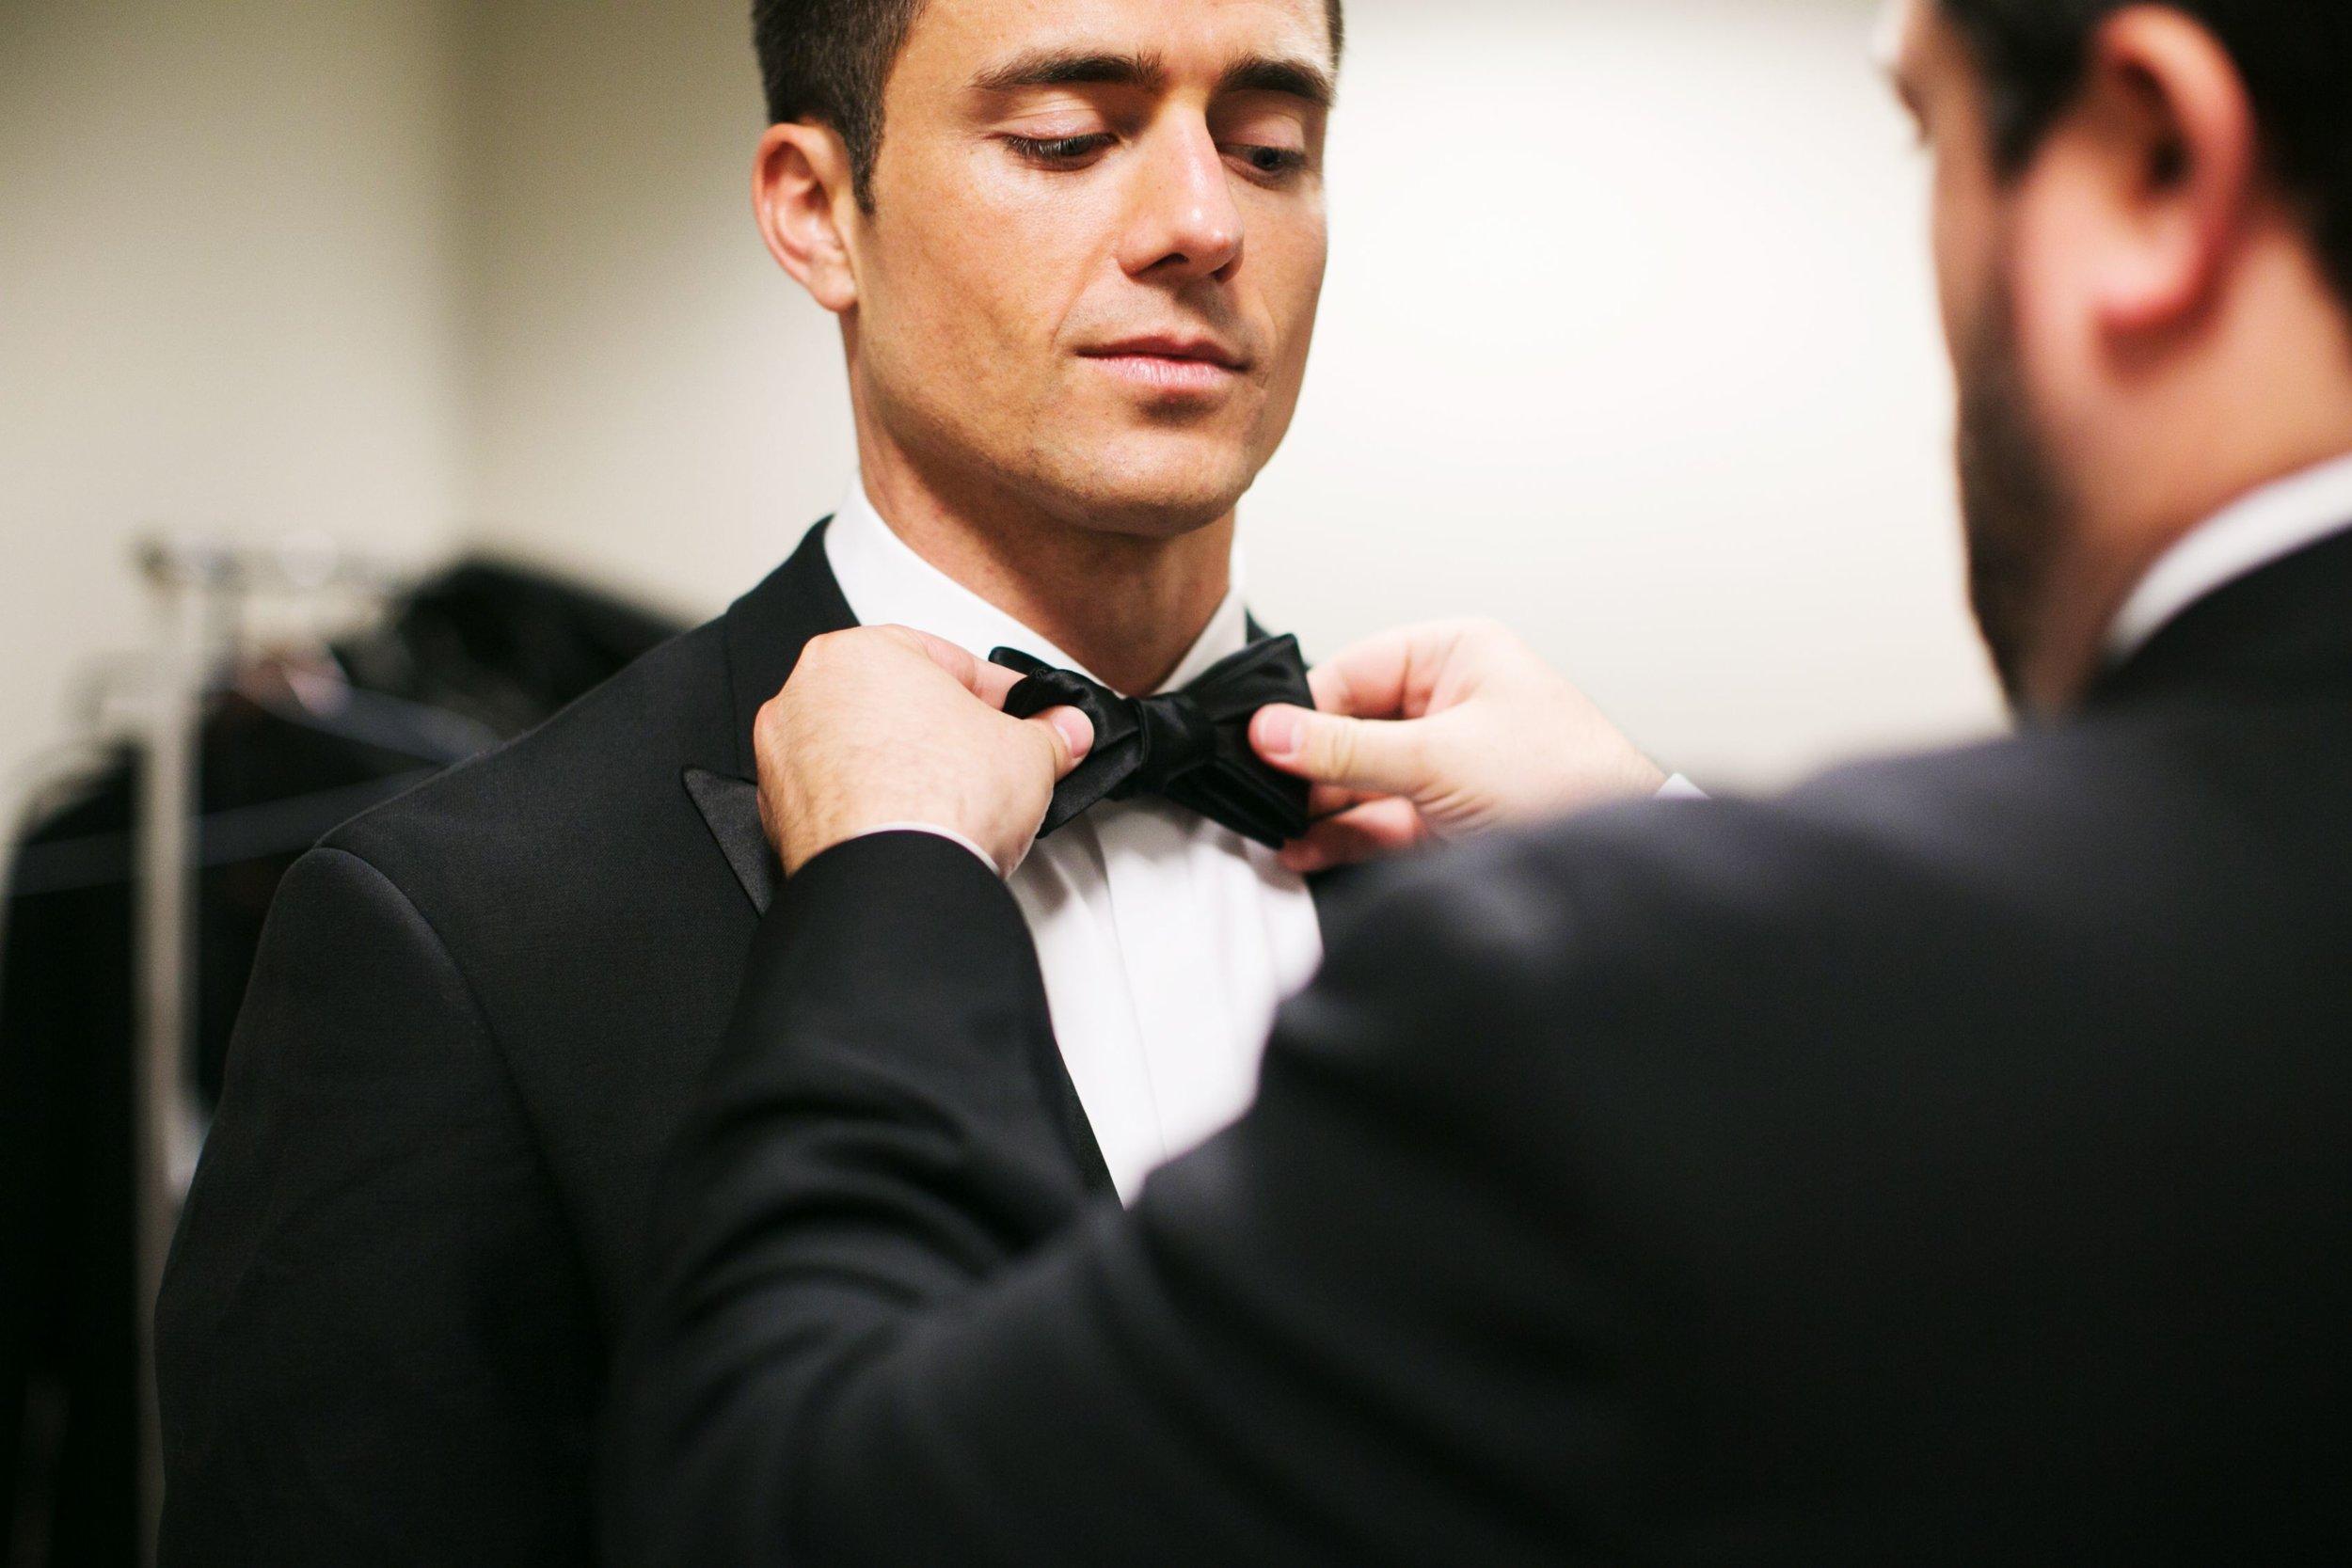 eephotome.alex.justin.wedding-83.jpg